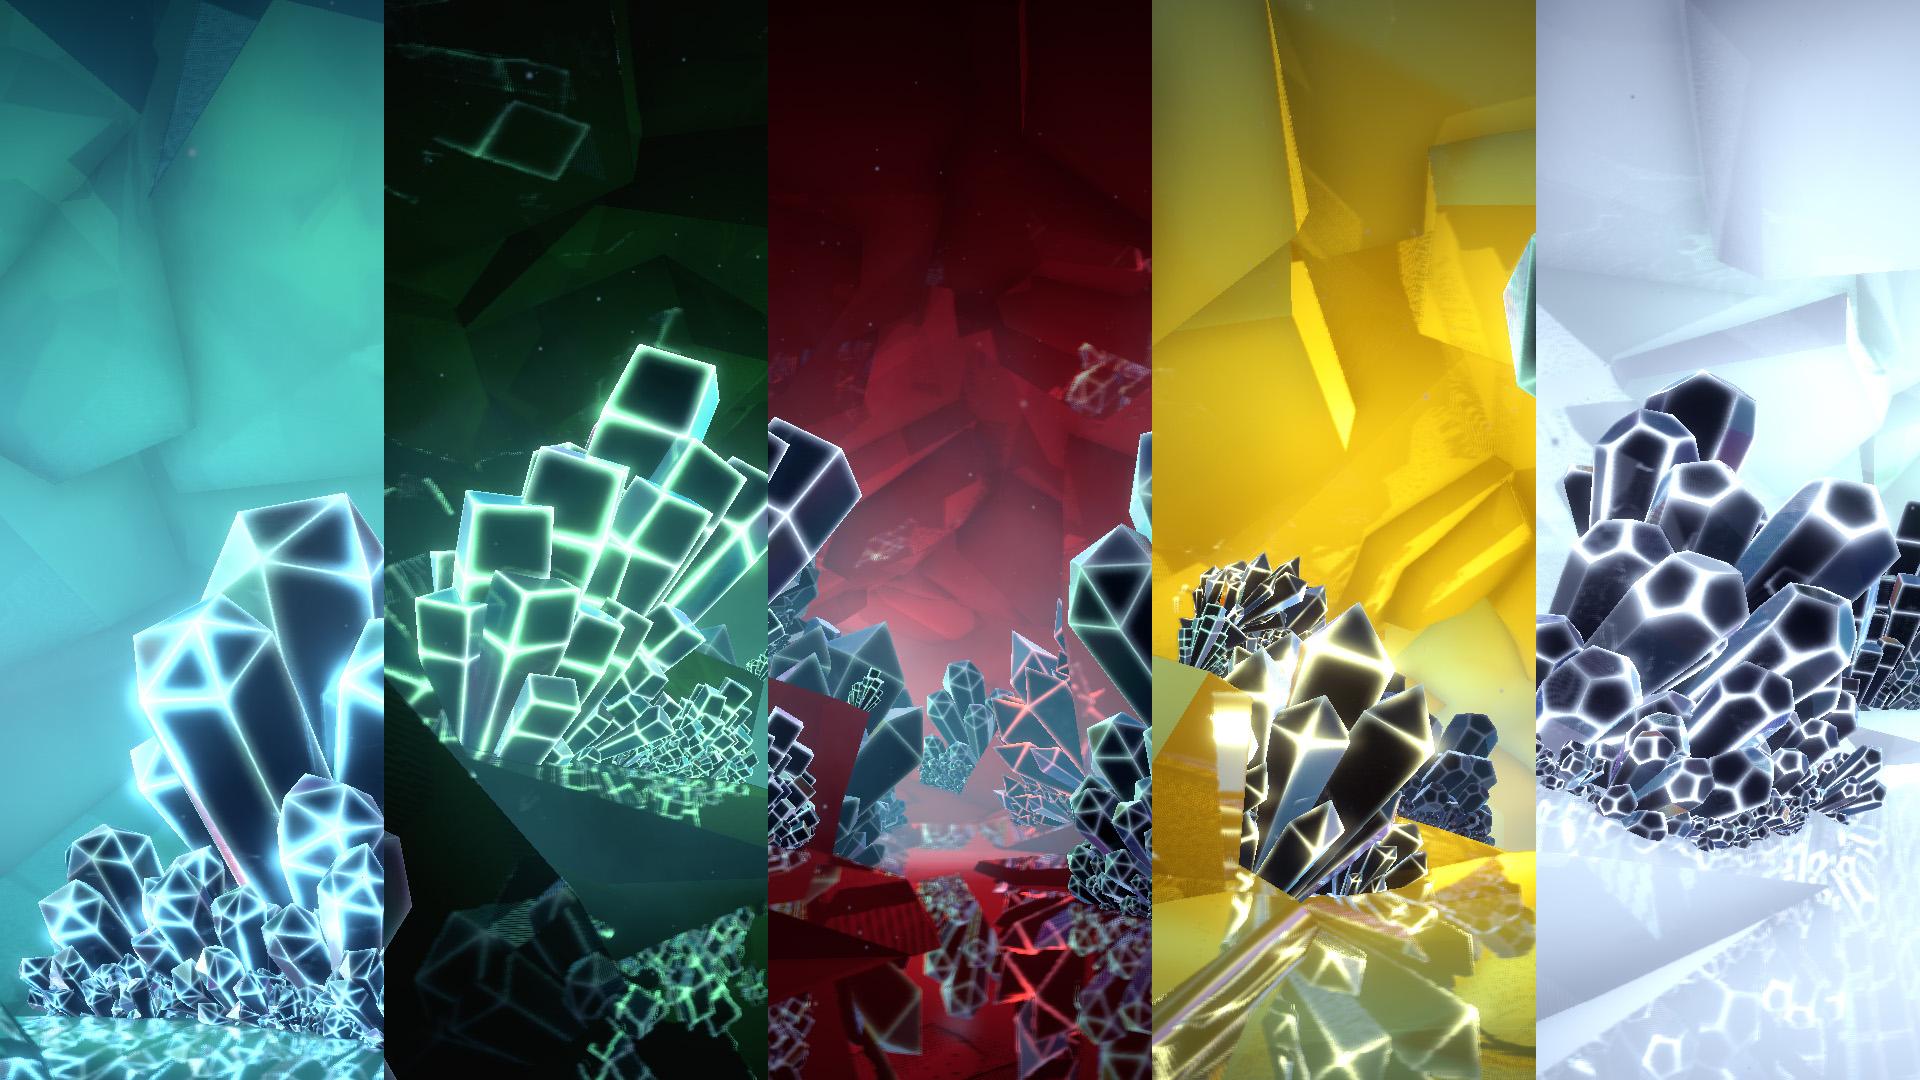 createx---museum-of-colliding-dimensions_29047481326_o